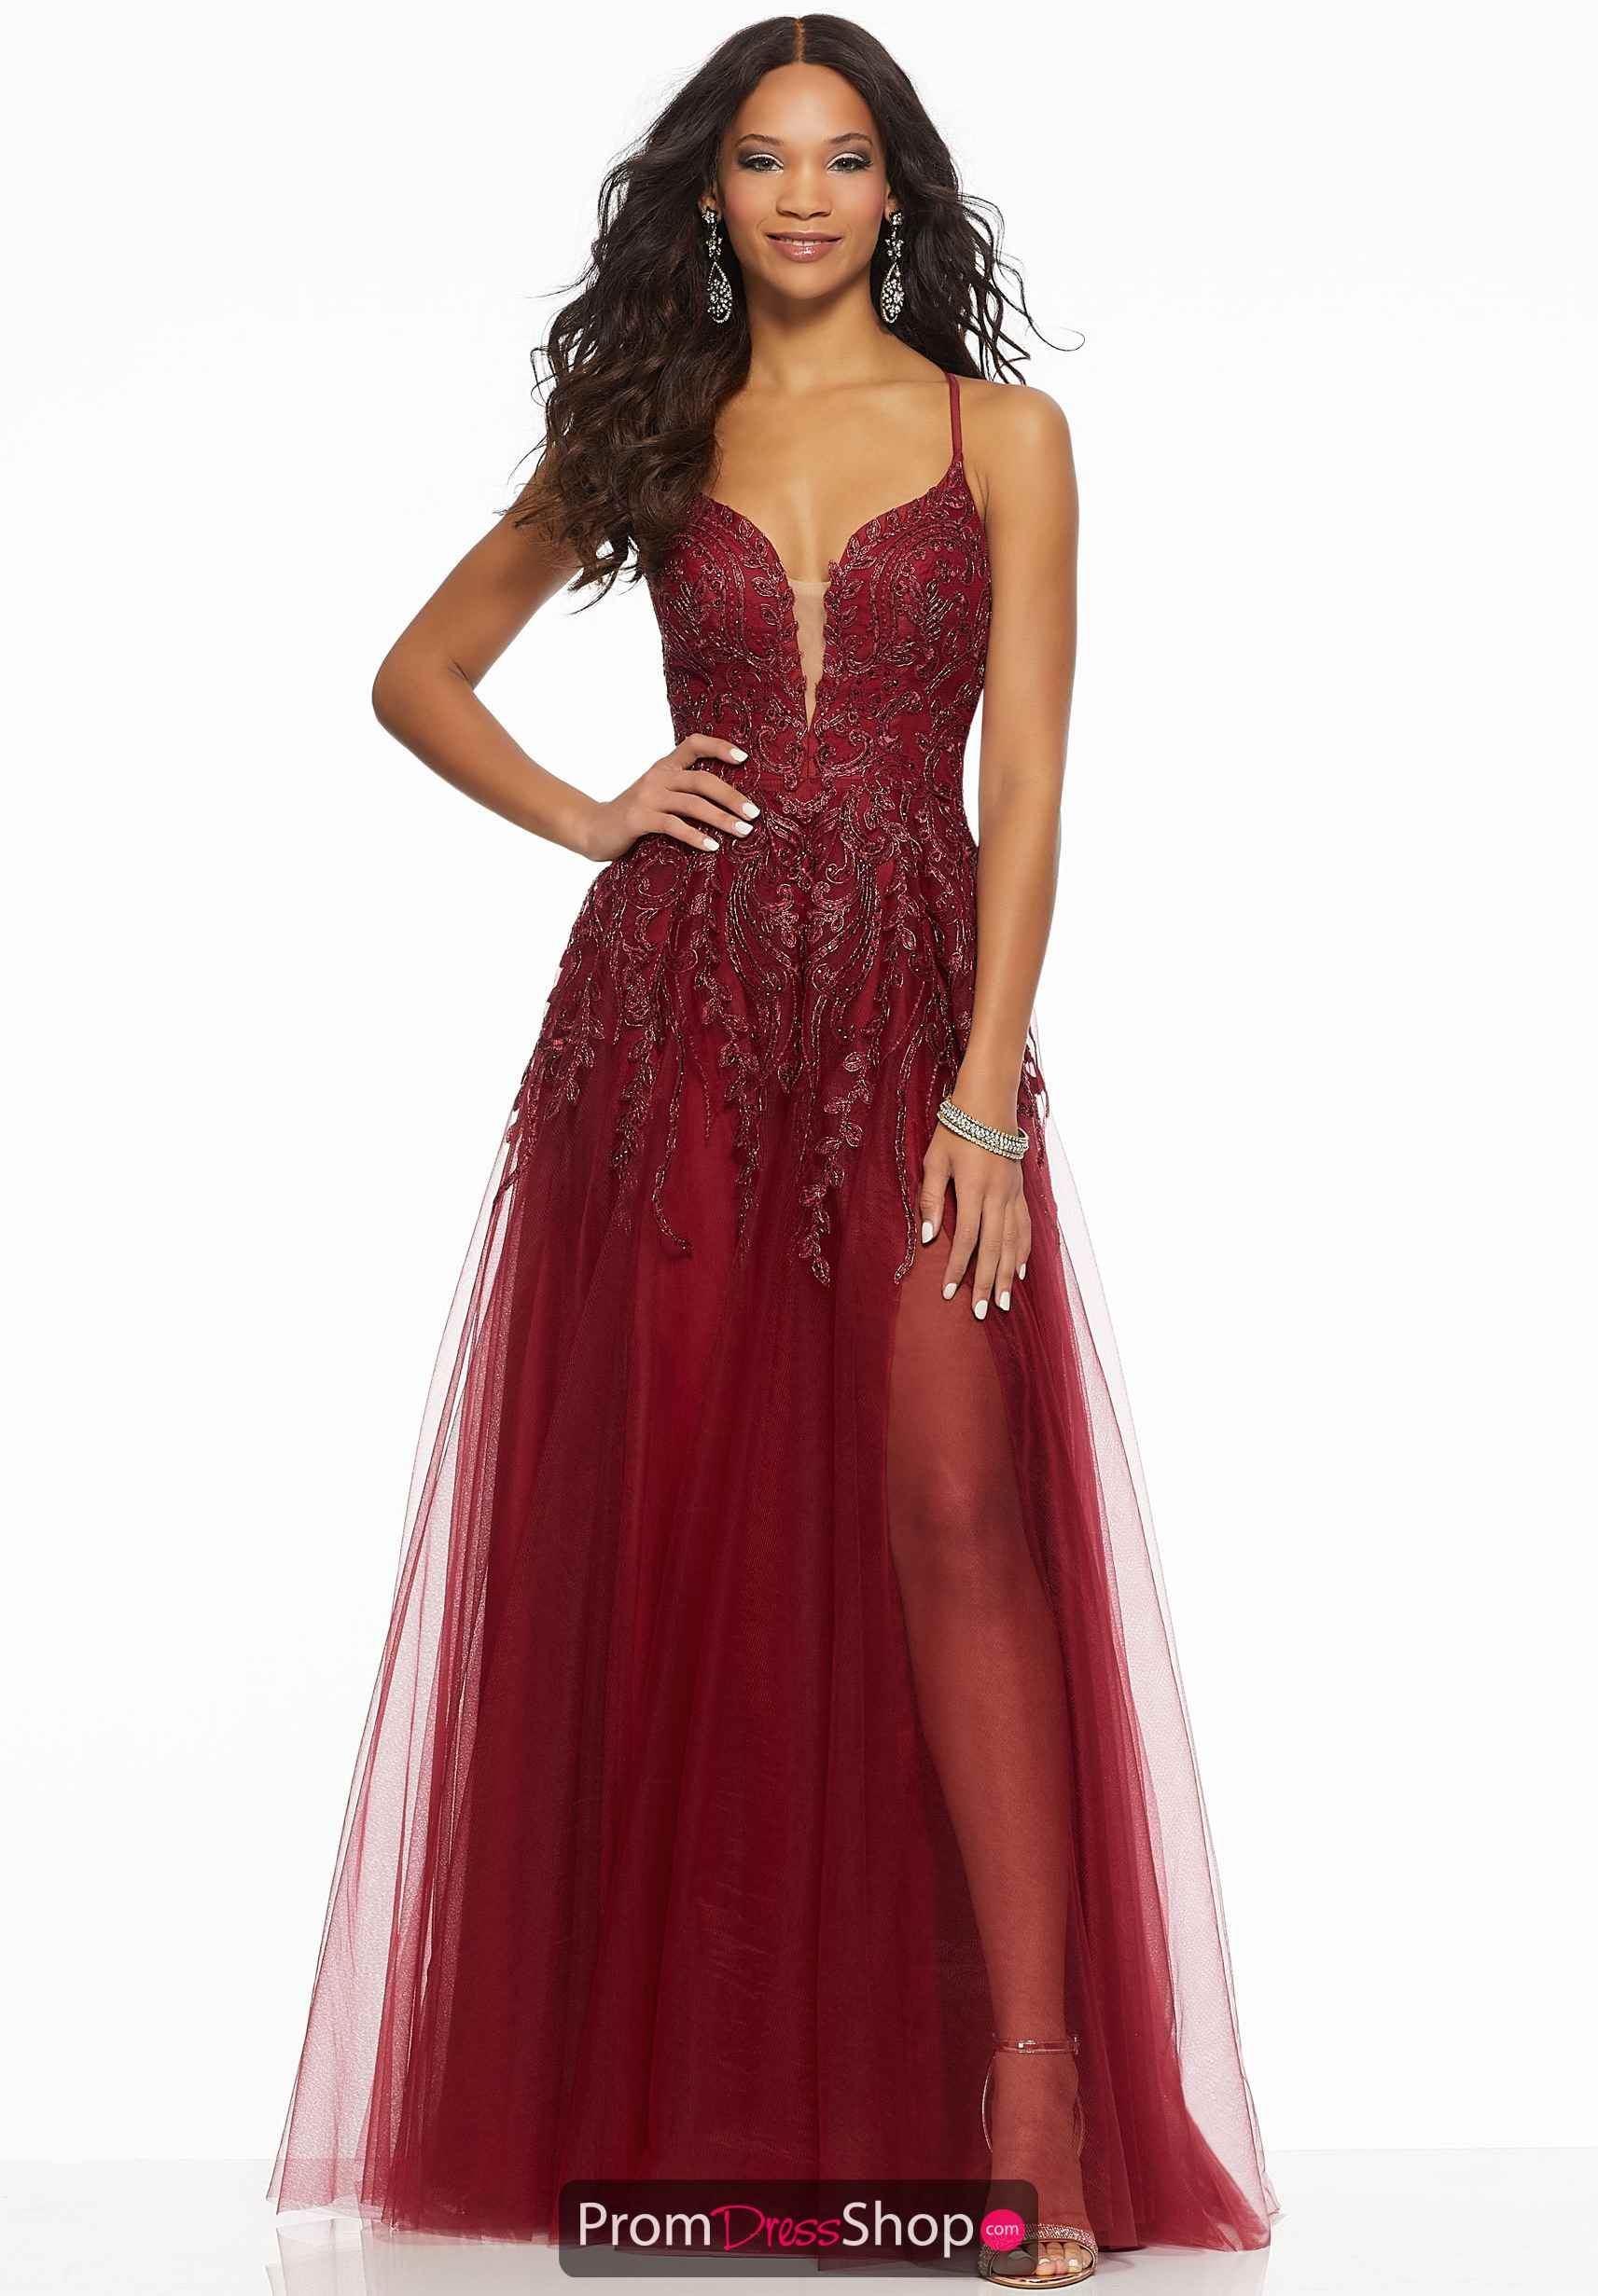 5598b371e18a Wine Mori Lee Prom Dresses, Mermaid Prom Dresses, Sparkly Prom Dresses,  Pageant Dresses